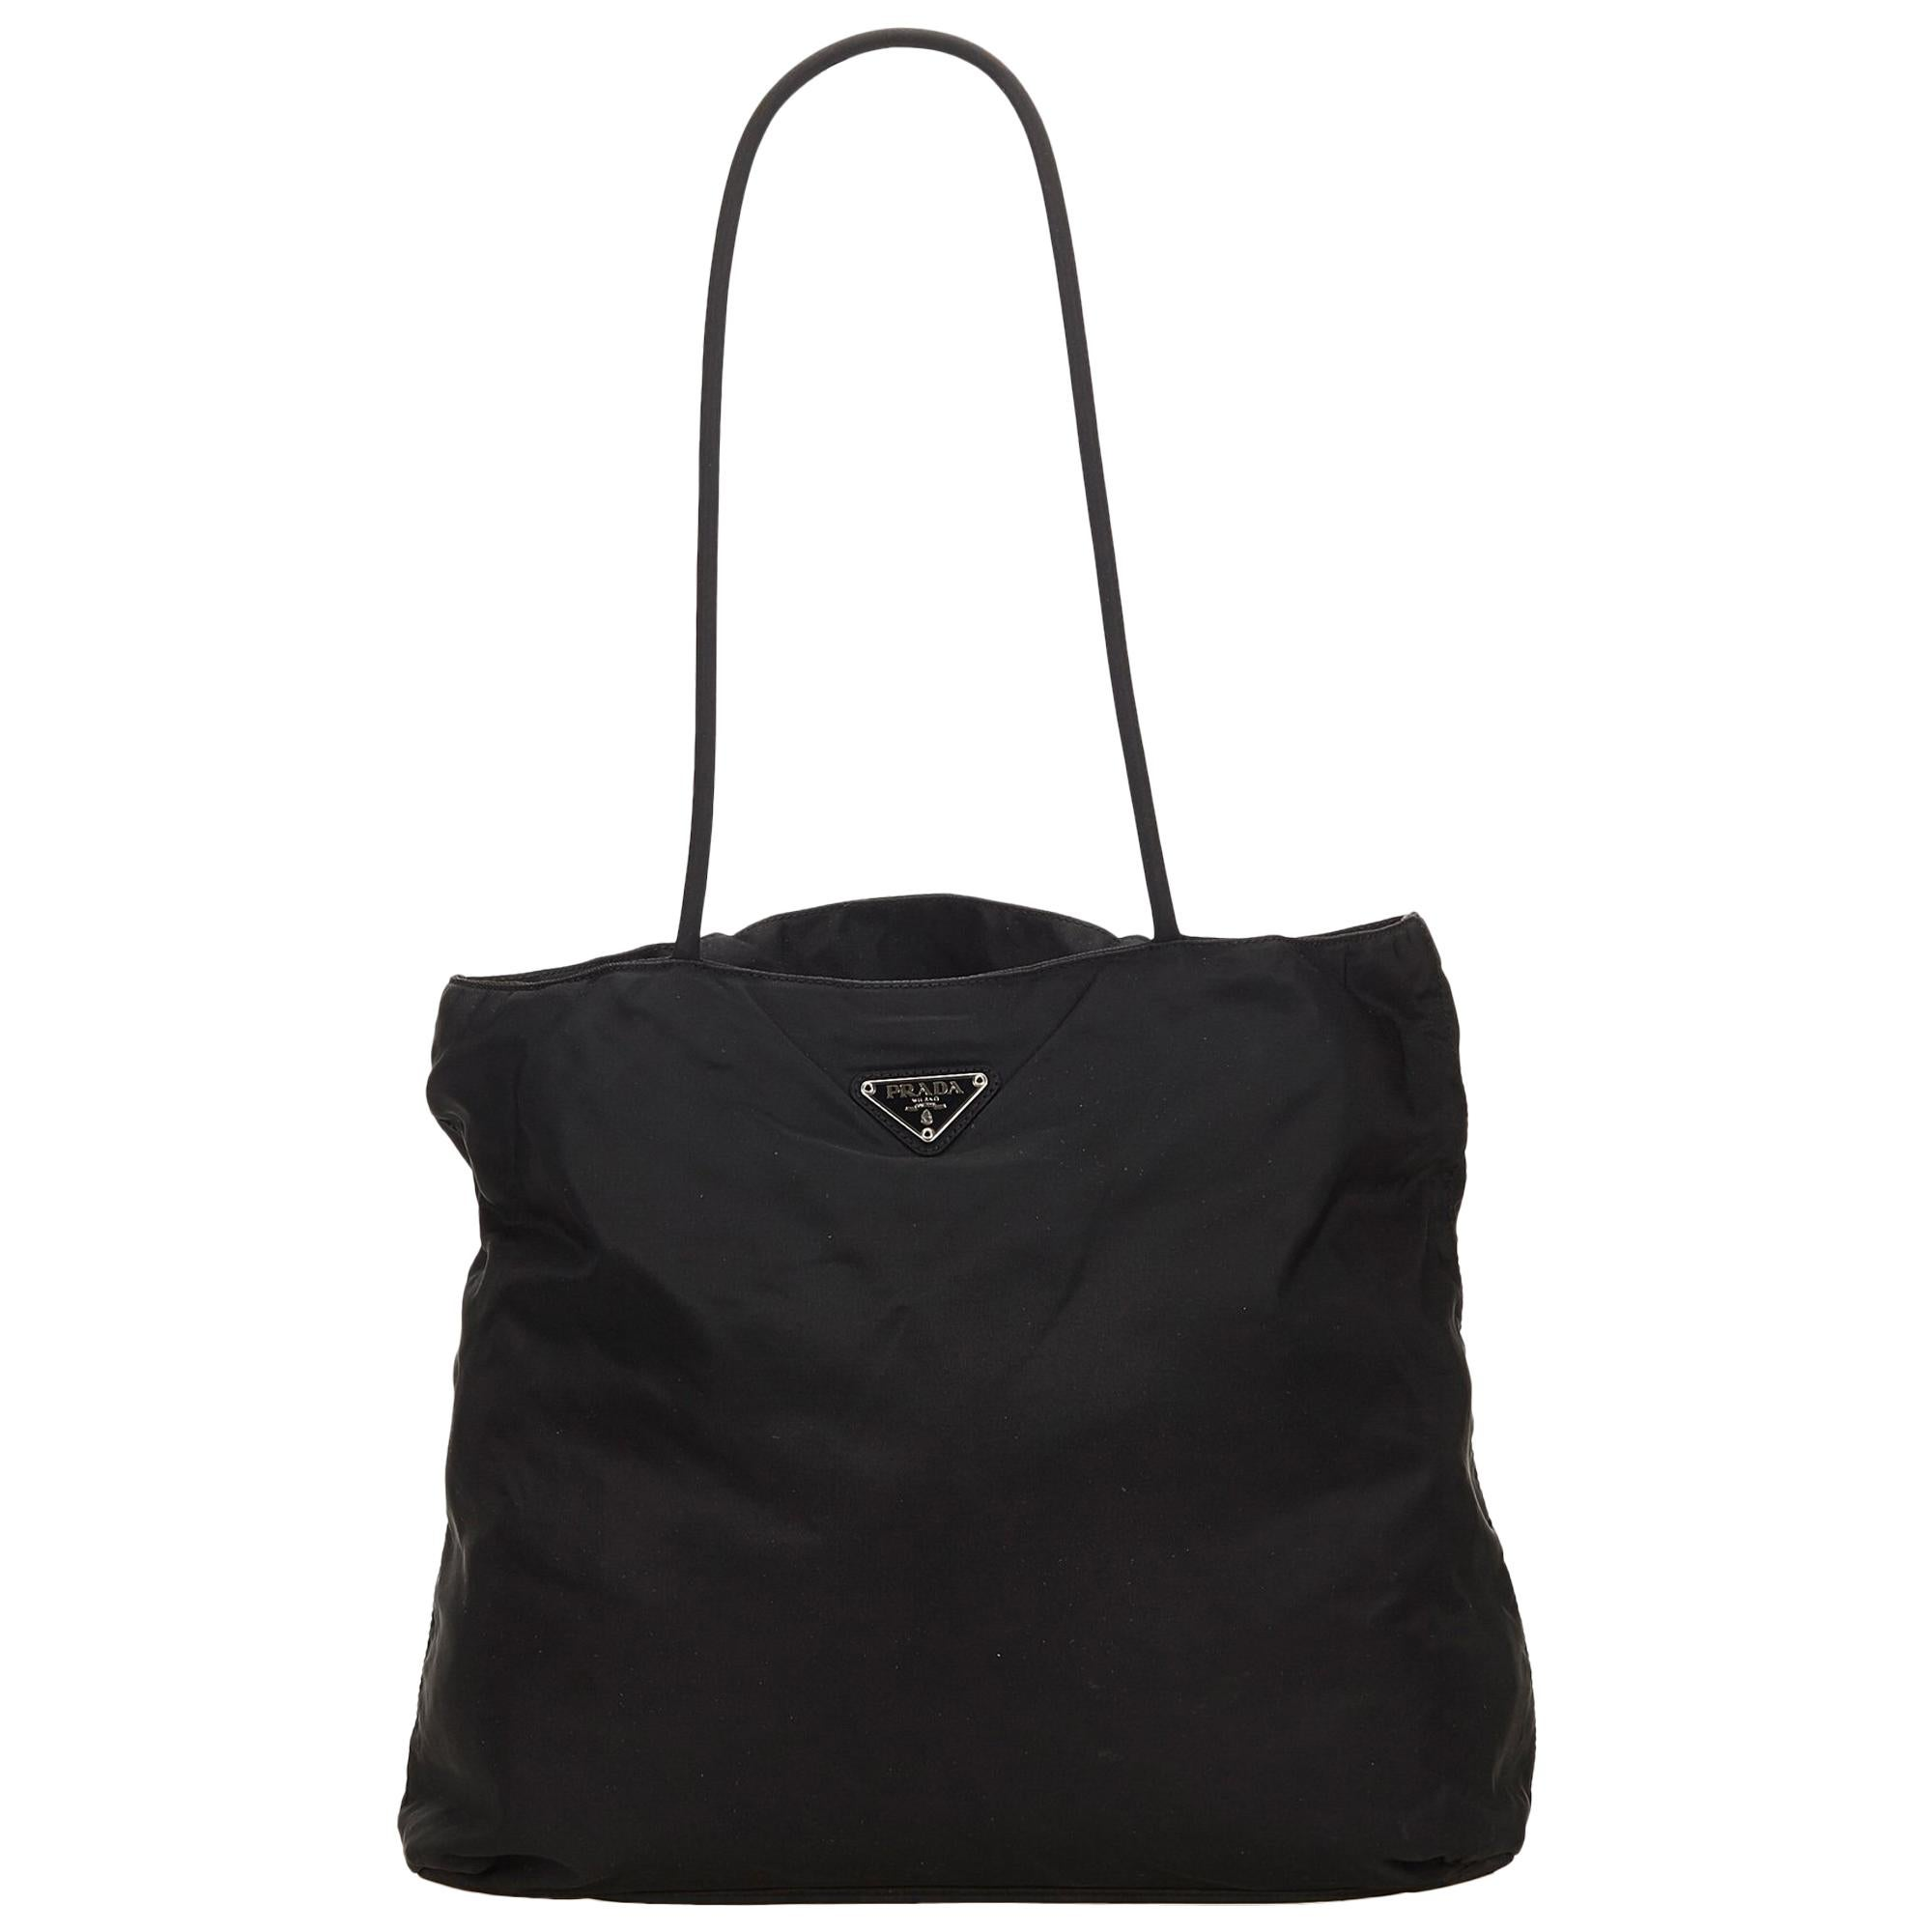 f75b23838c inexpensive prada tote in black e25f0 8d669  reduced prada black nylon tote  bag for sale 54dfc f065f